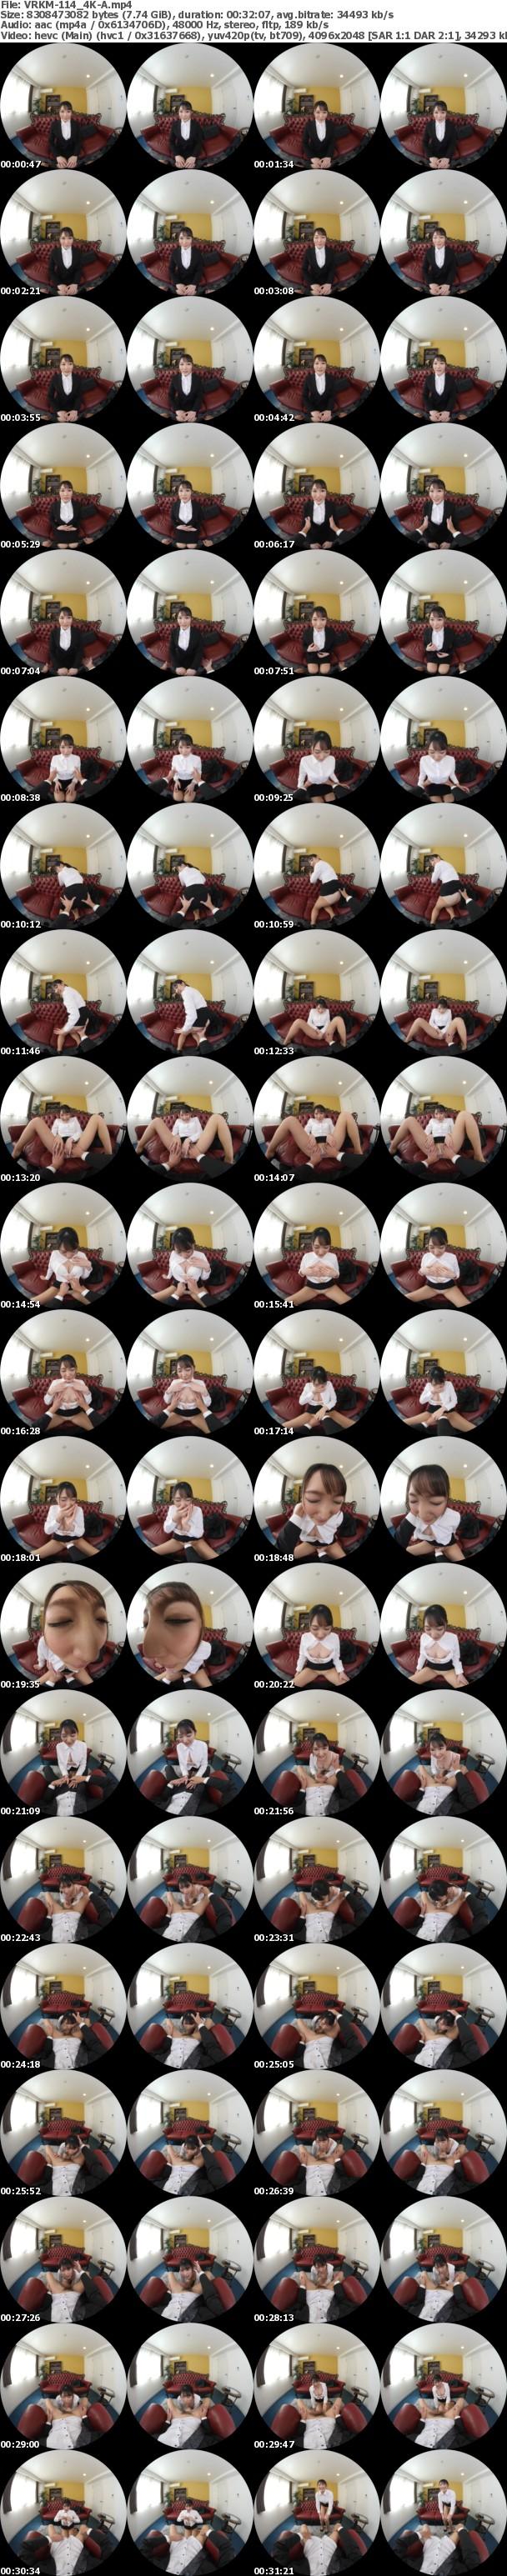 (VR) (4K) VRKM-114 内定欲しさにどんなお願いも笑顔で受け入れる崖っぷち就活女子大生のイキまくり面接 武田エレナ